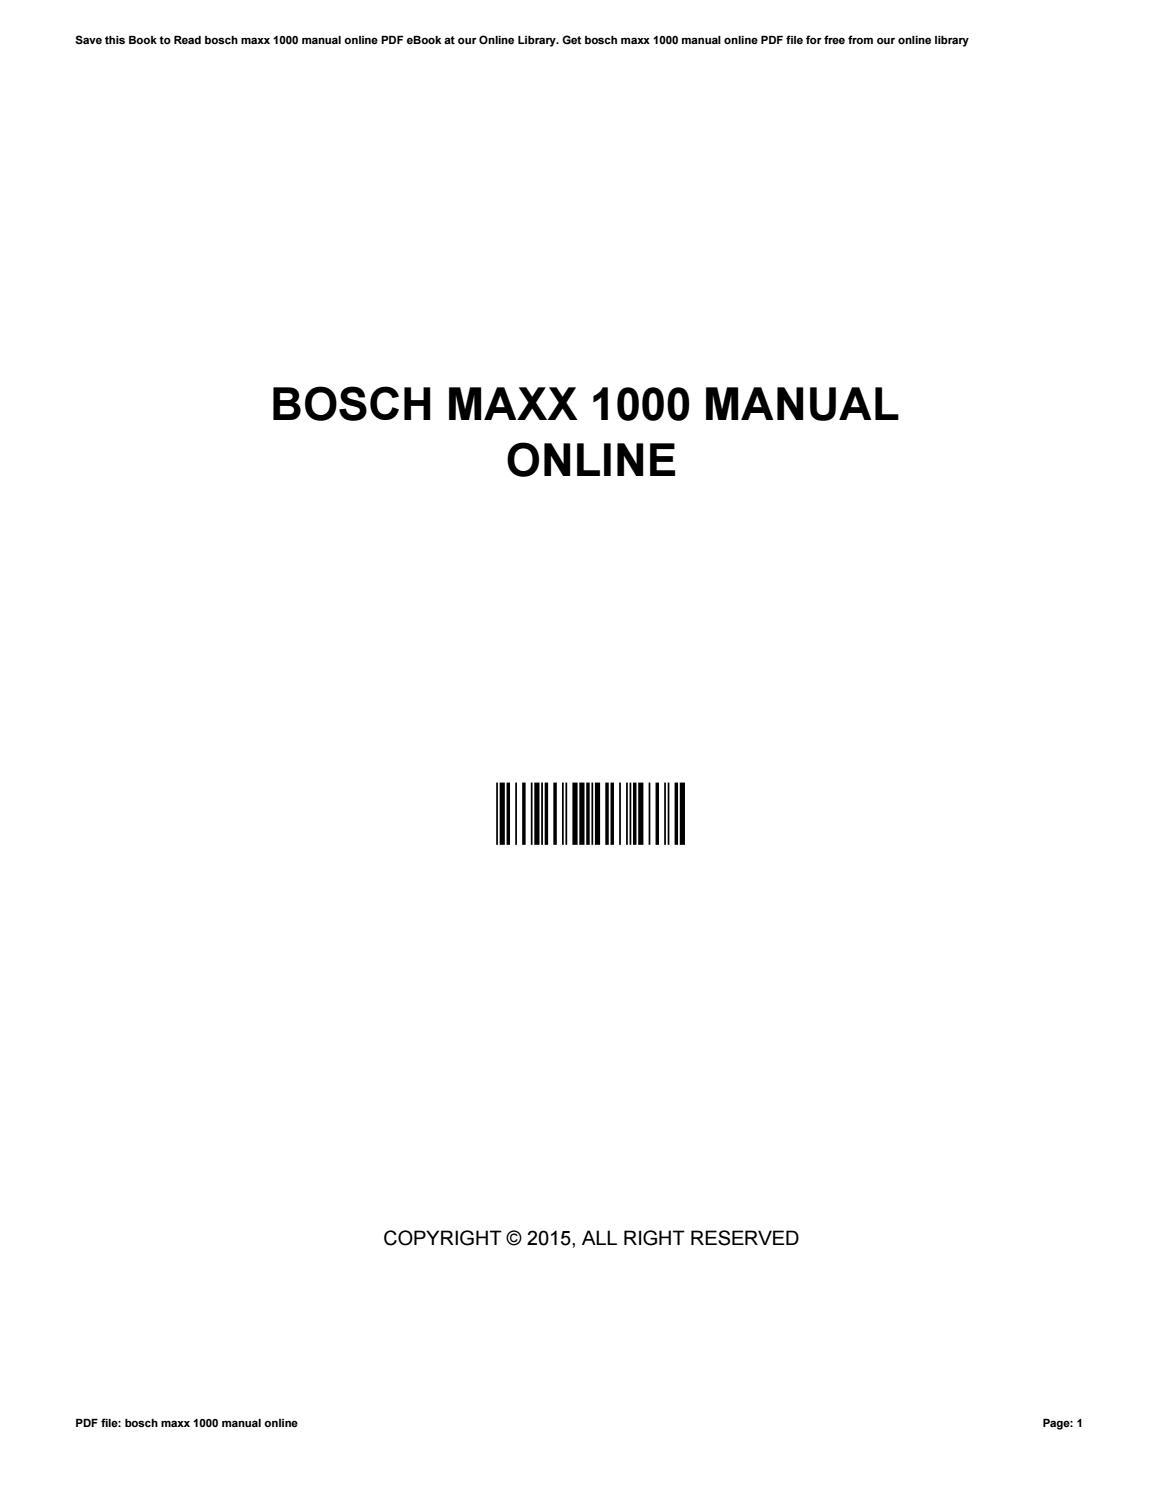 Bosch Maxx 1000 Manual Online By Thomassalter3888 Issuu border=